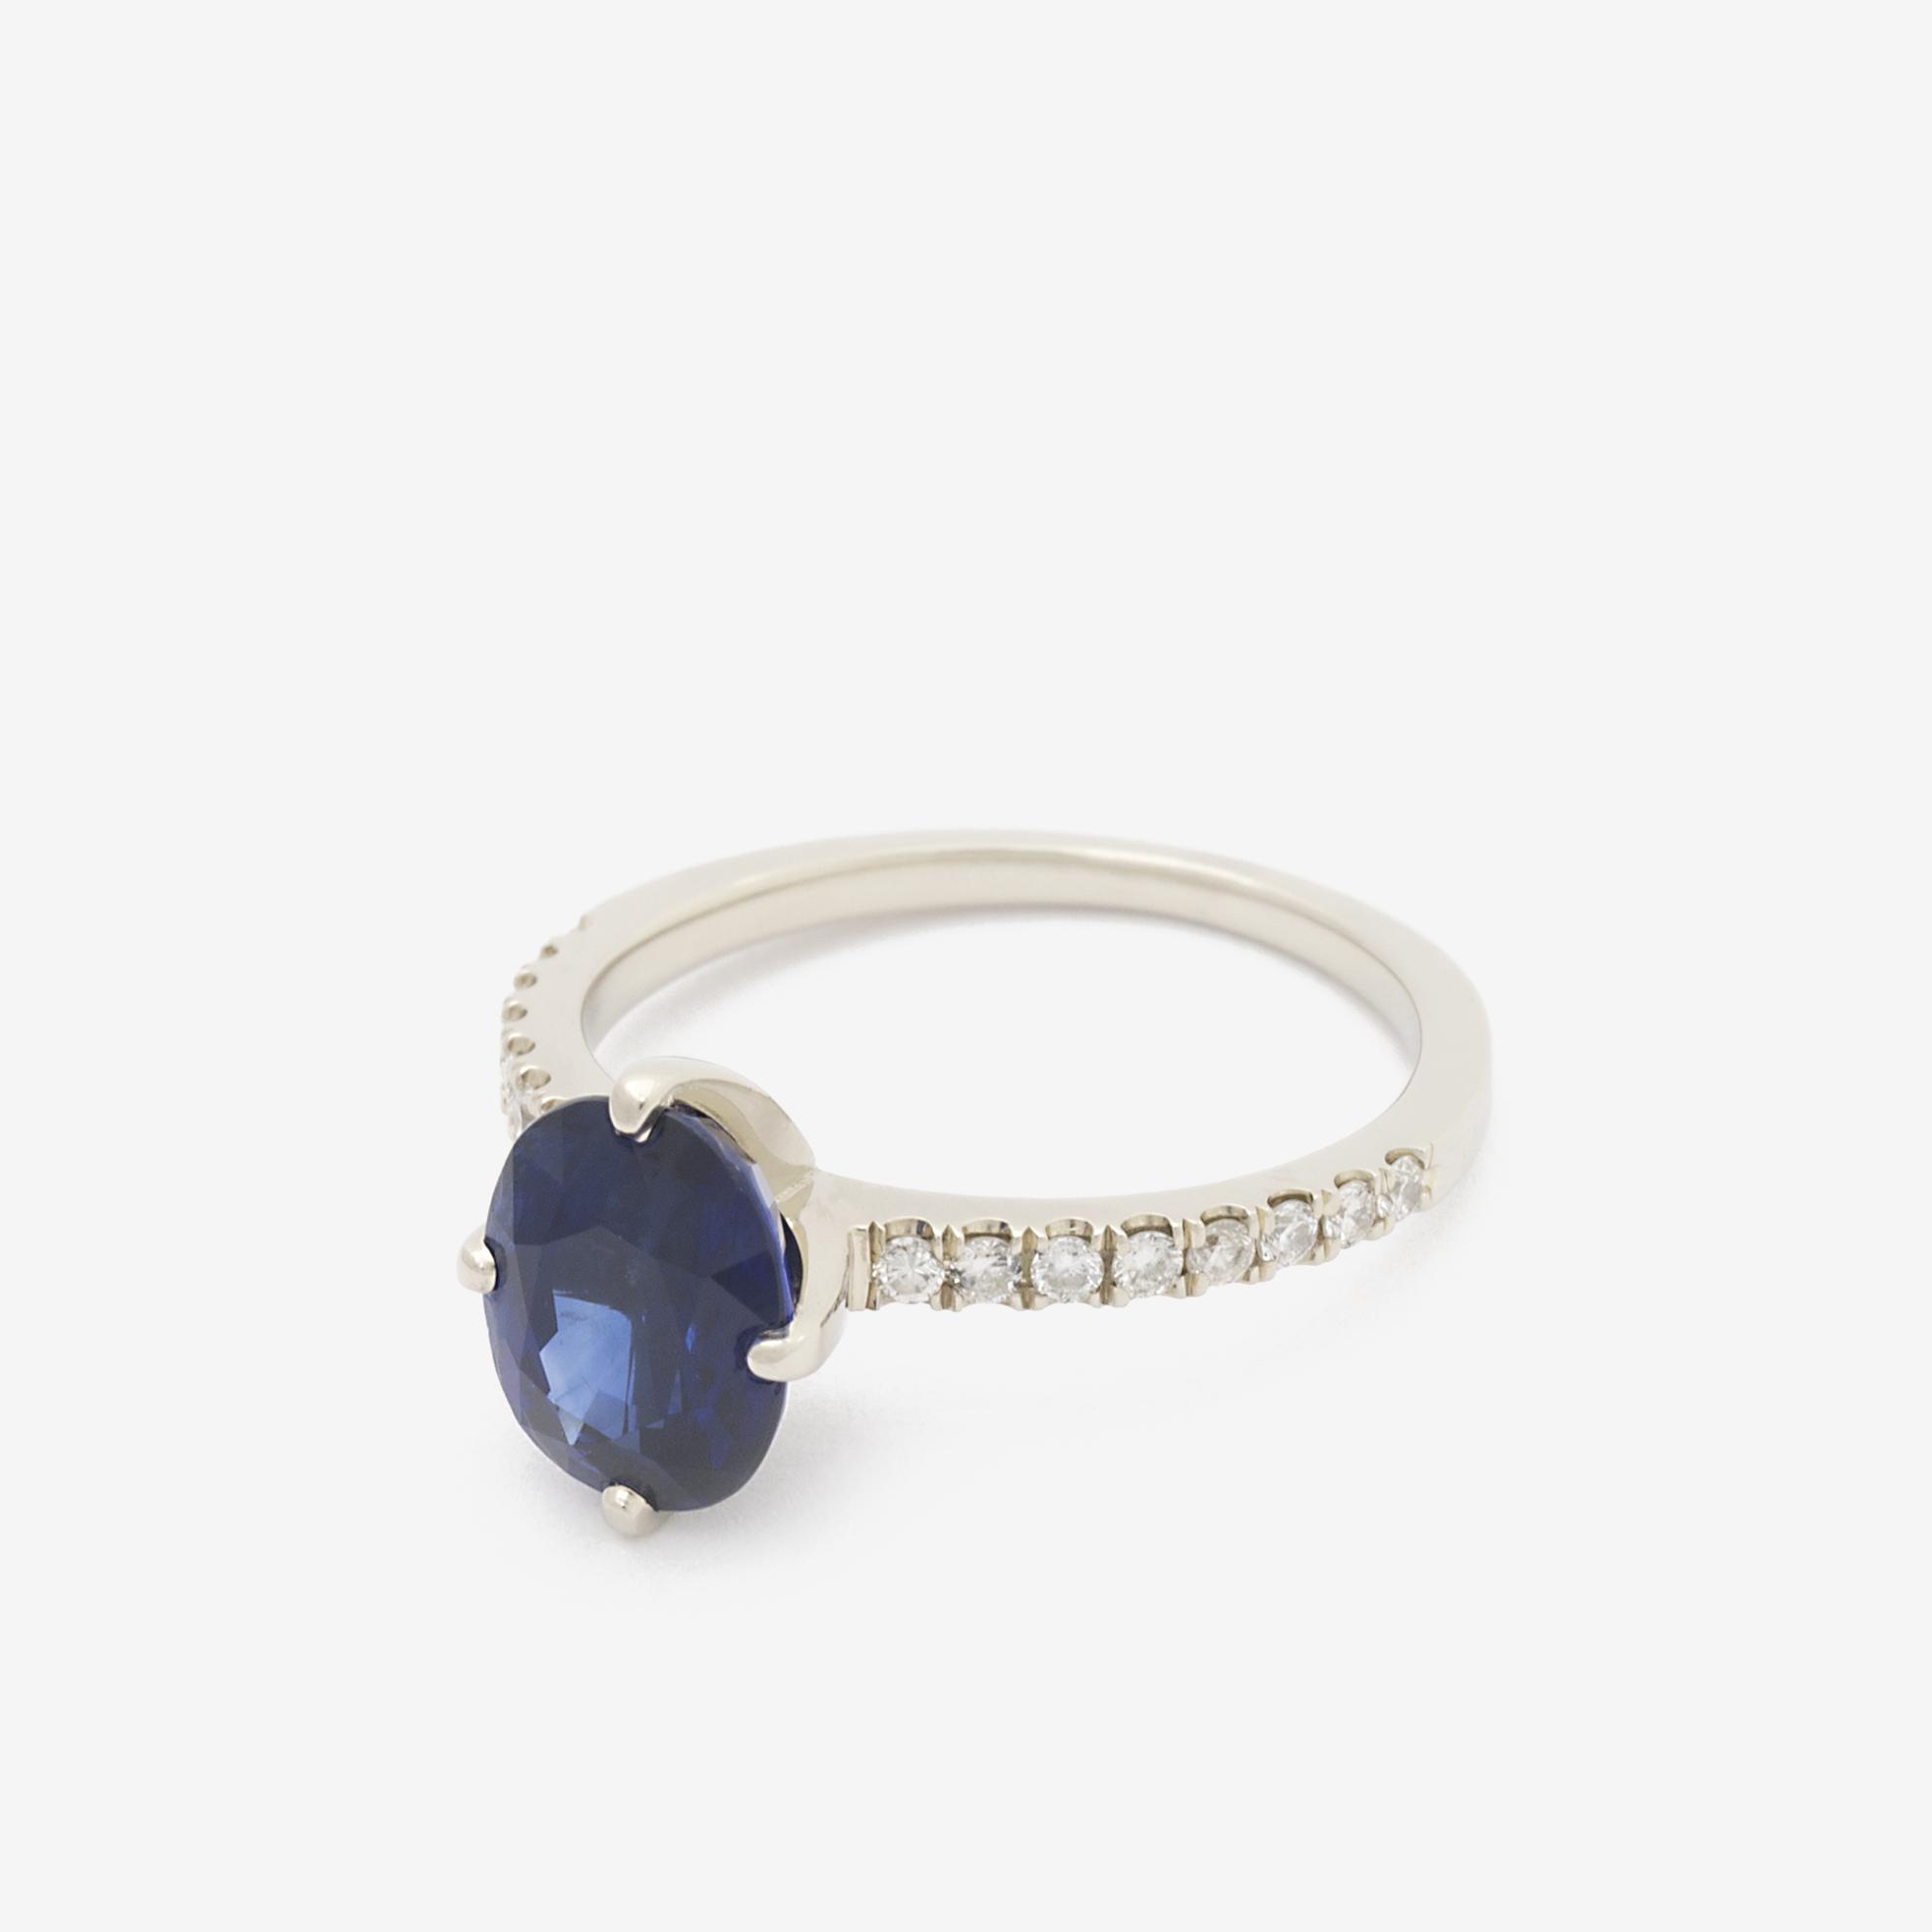 Michaela - White Gold Sapphire and Diamond Engagement Ring.jpg